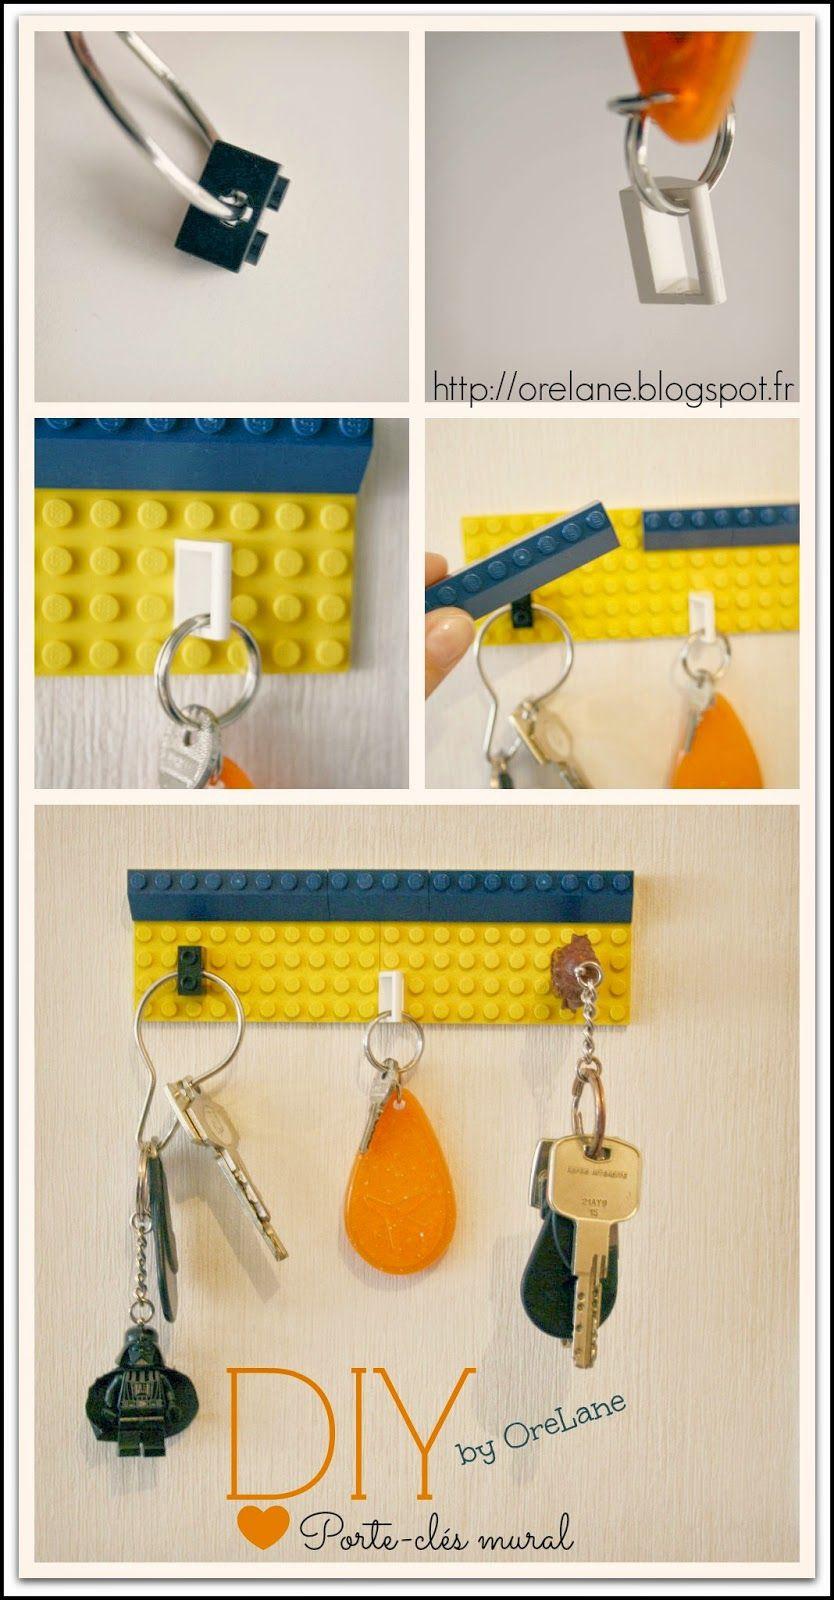 c64a5e4e784c DIY   Un porte-clé mural original avec des Lego   DIY by Orelane ...